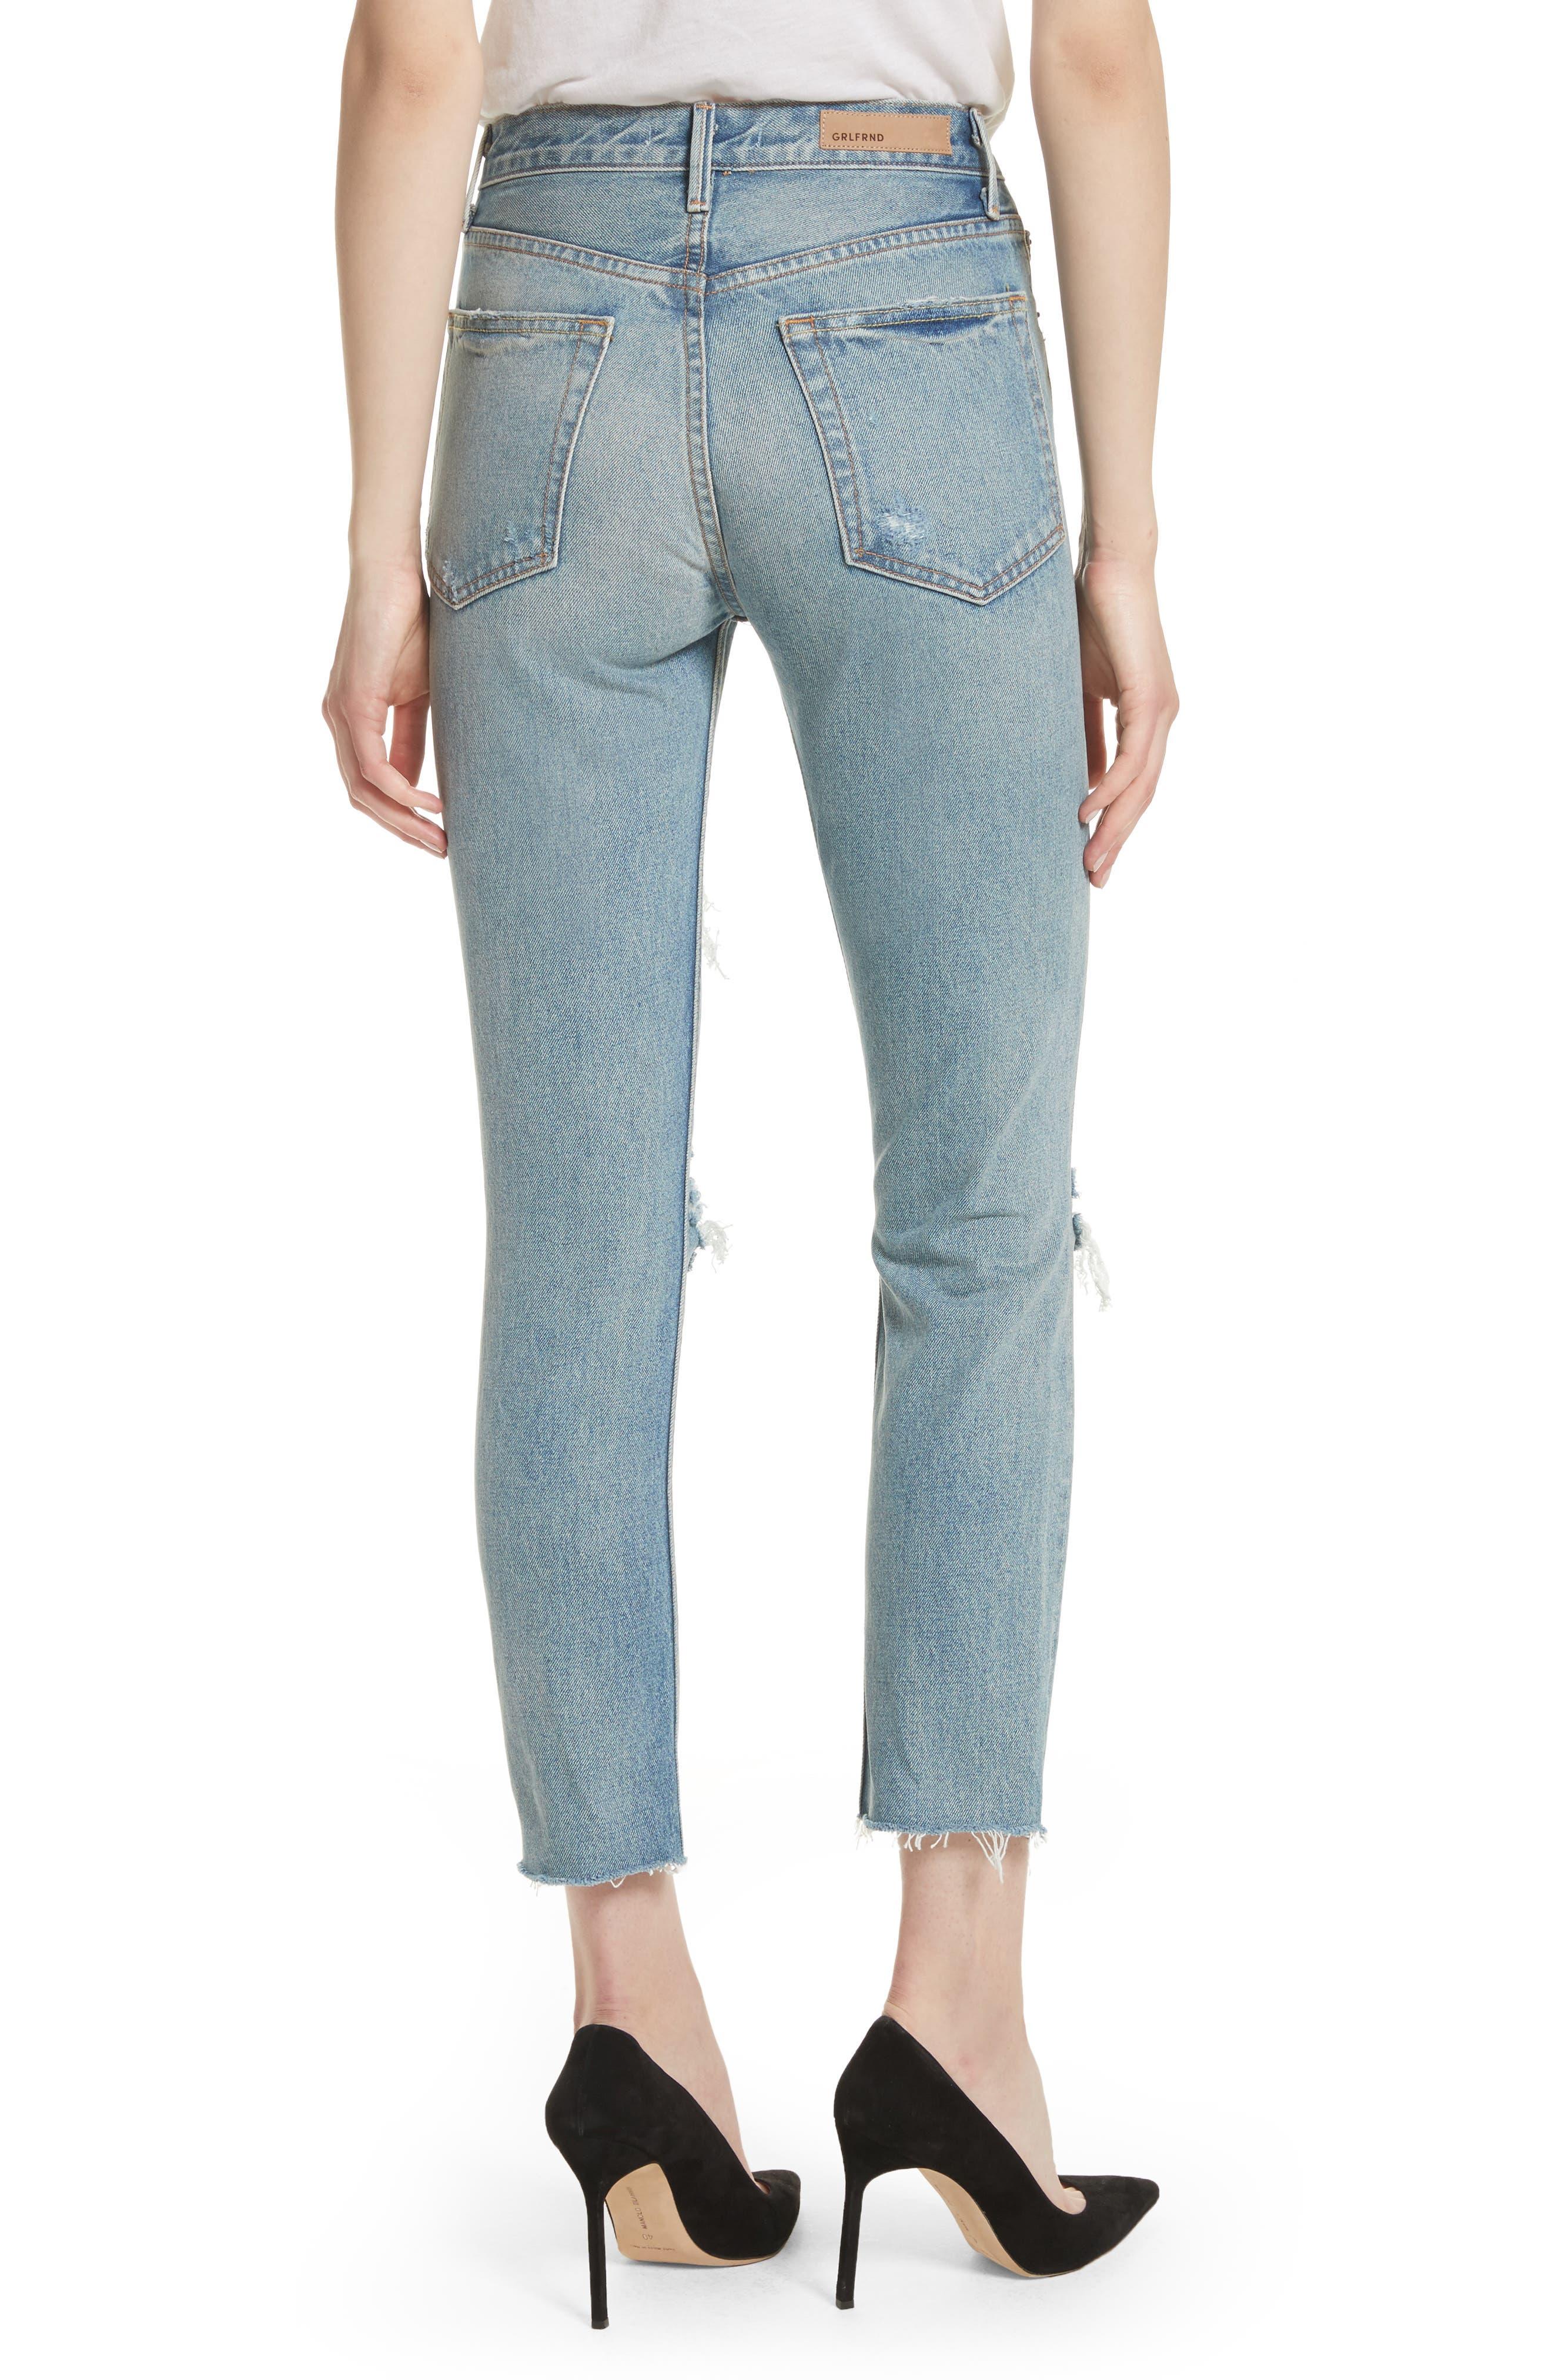 GRLFRND, Karolina Rigid High Waist Skinny Jeans, Alternate thumbnail 2, color, A LITTLE MORE LOVE